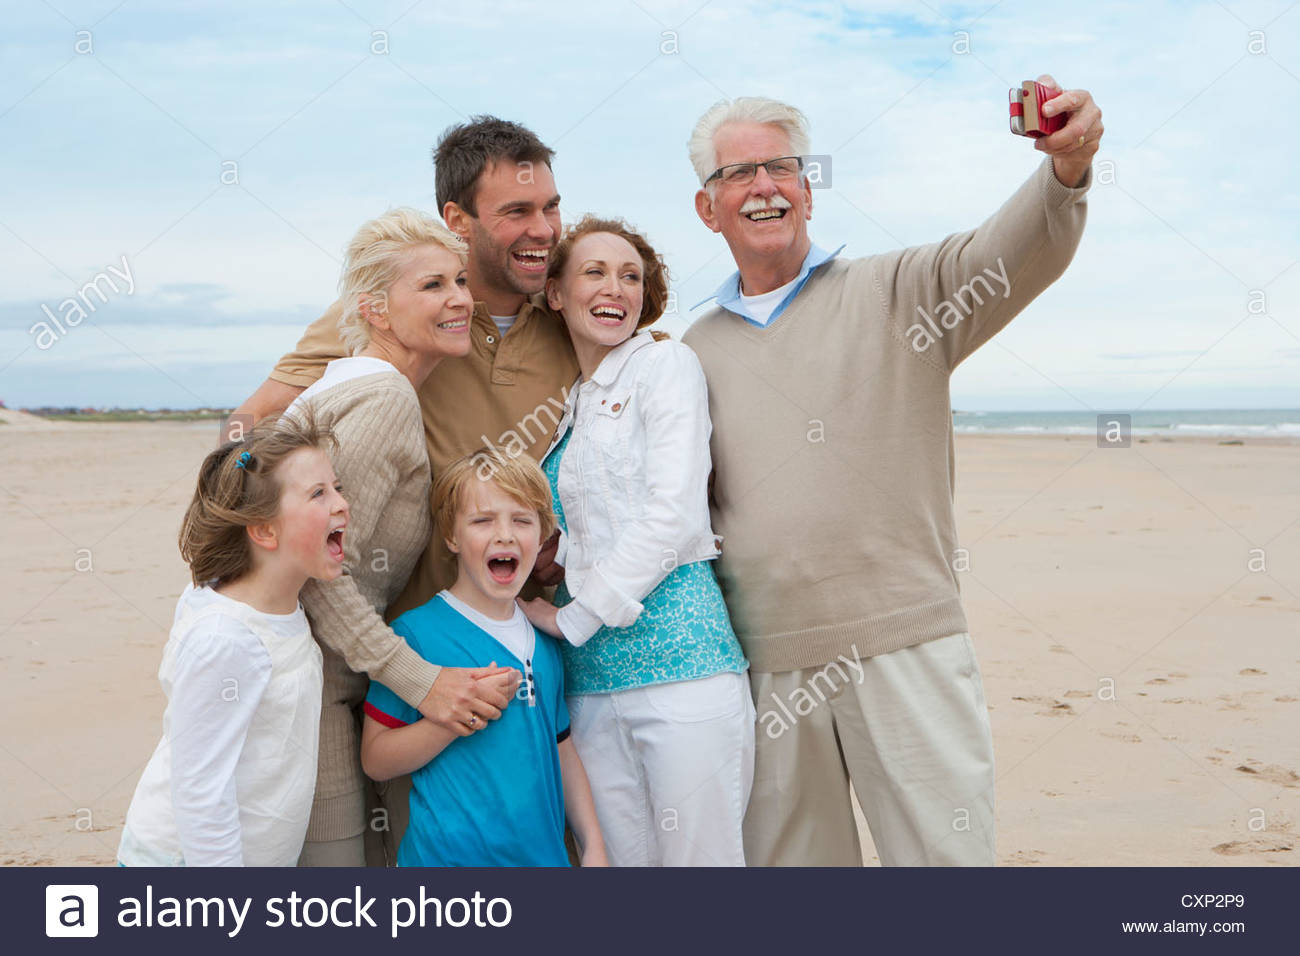 Taking Photo Of Multi Generation Family On Beach Holiday - Stock Image